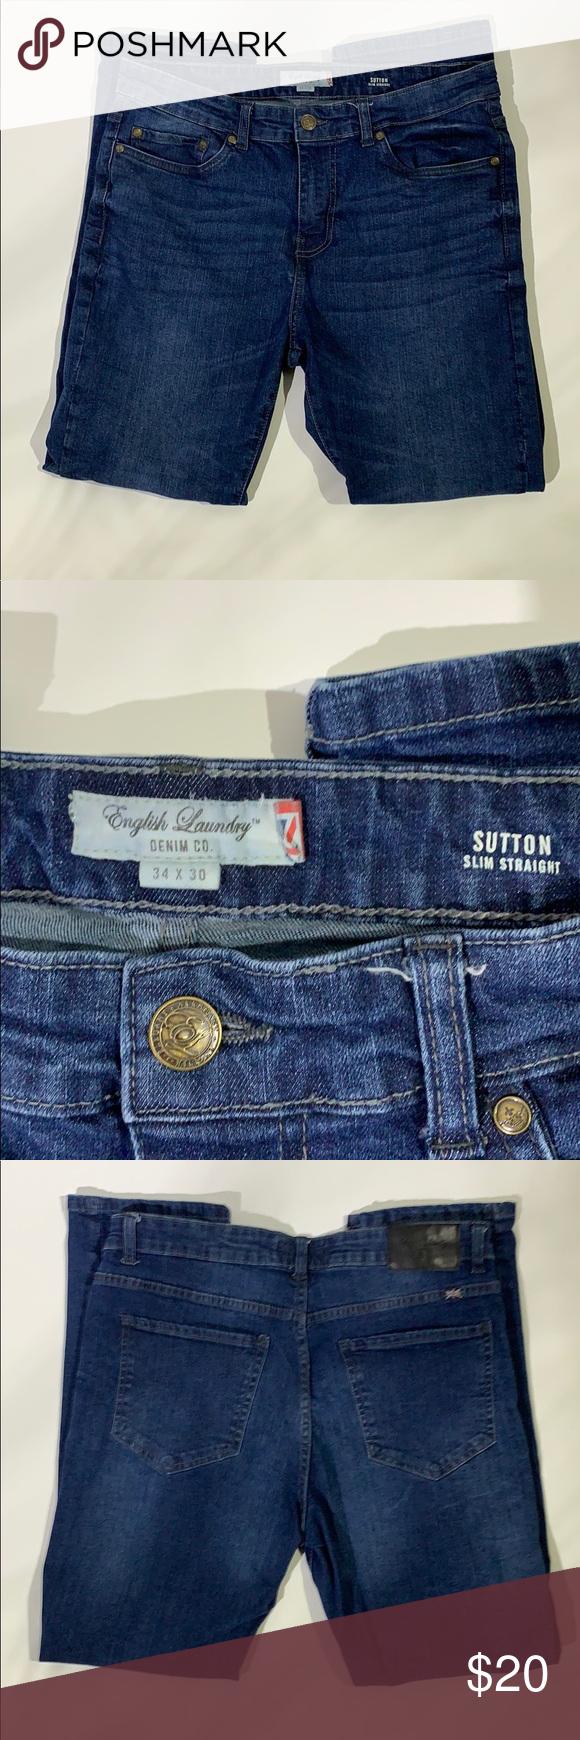 English Laundry Sutton Slim Straight Jeans Slim Straight Jeans